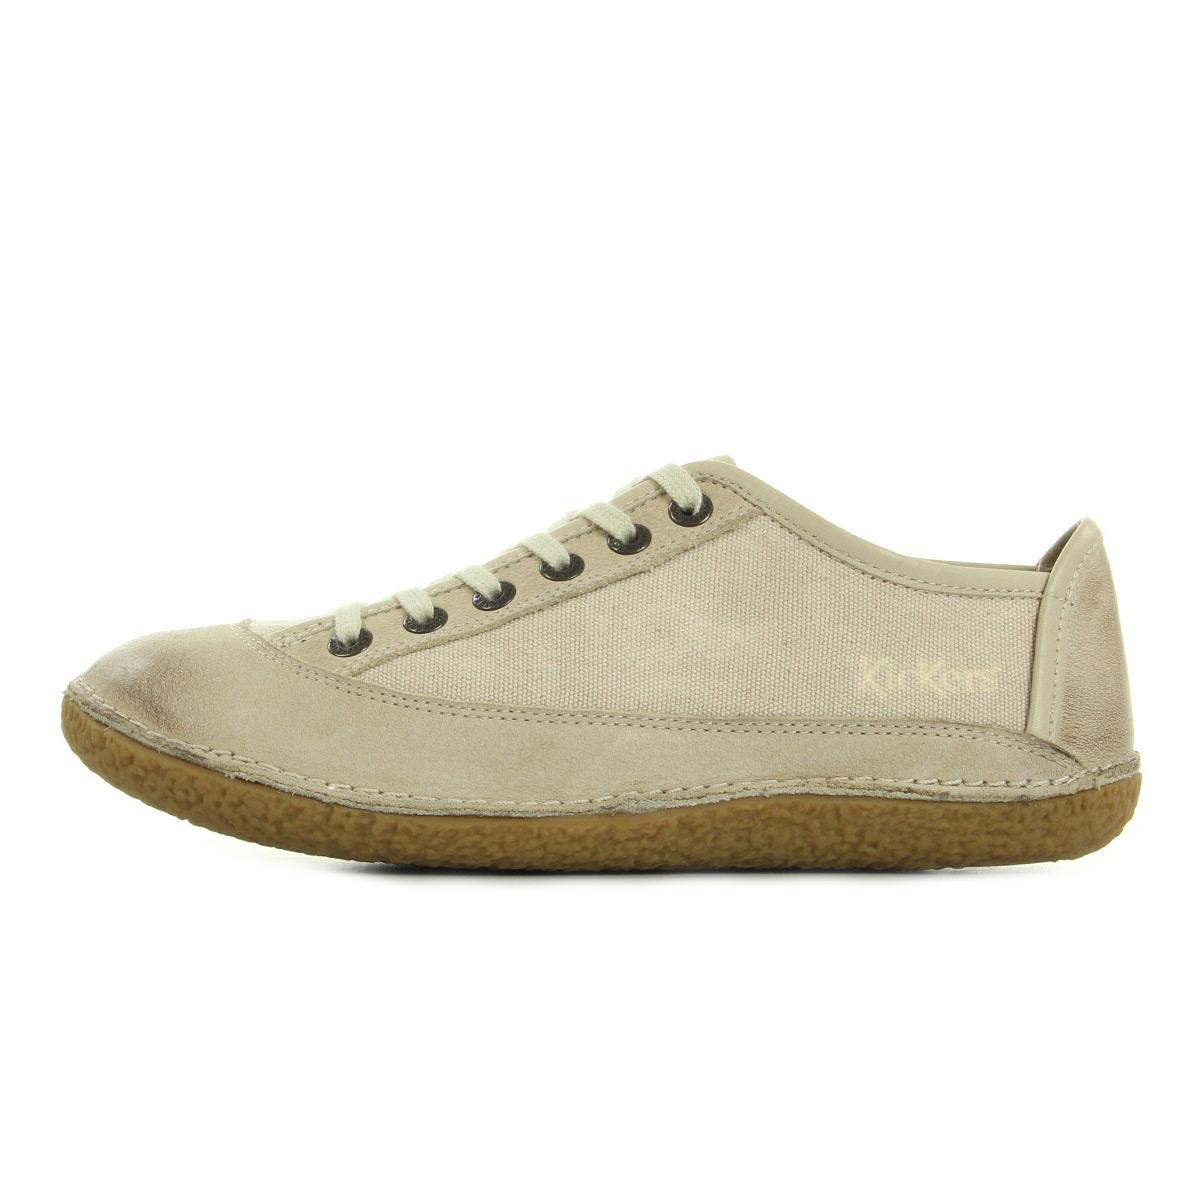 Kickers Hollyday Blanc Casse 4199545031, Baskets mode femme